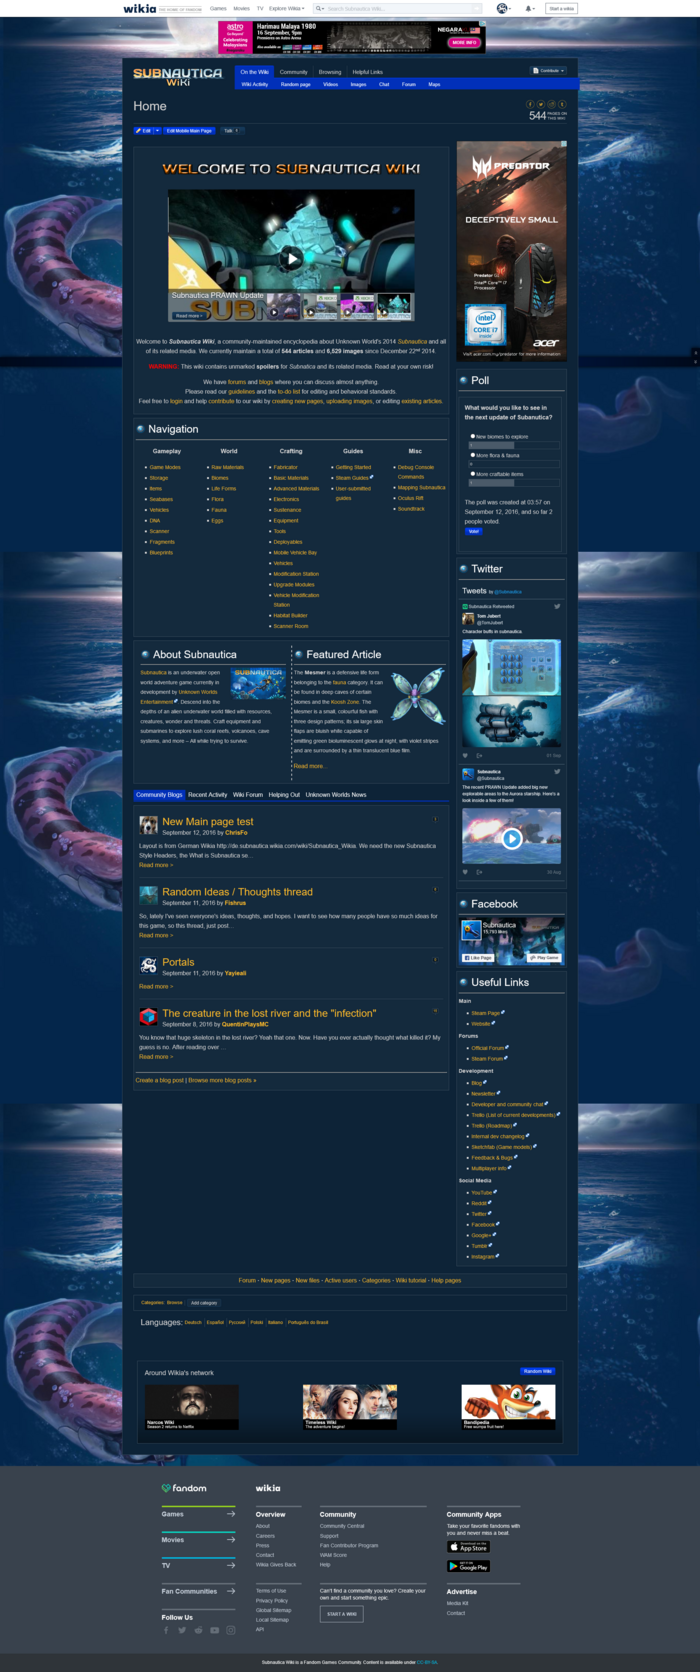 Subnautica Wiki - Wikia - 2016-09-12 13.14.29